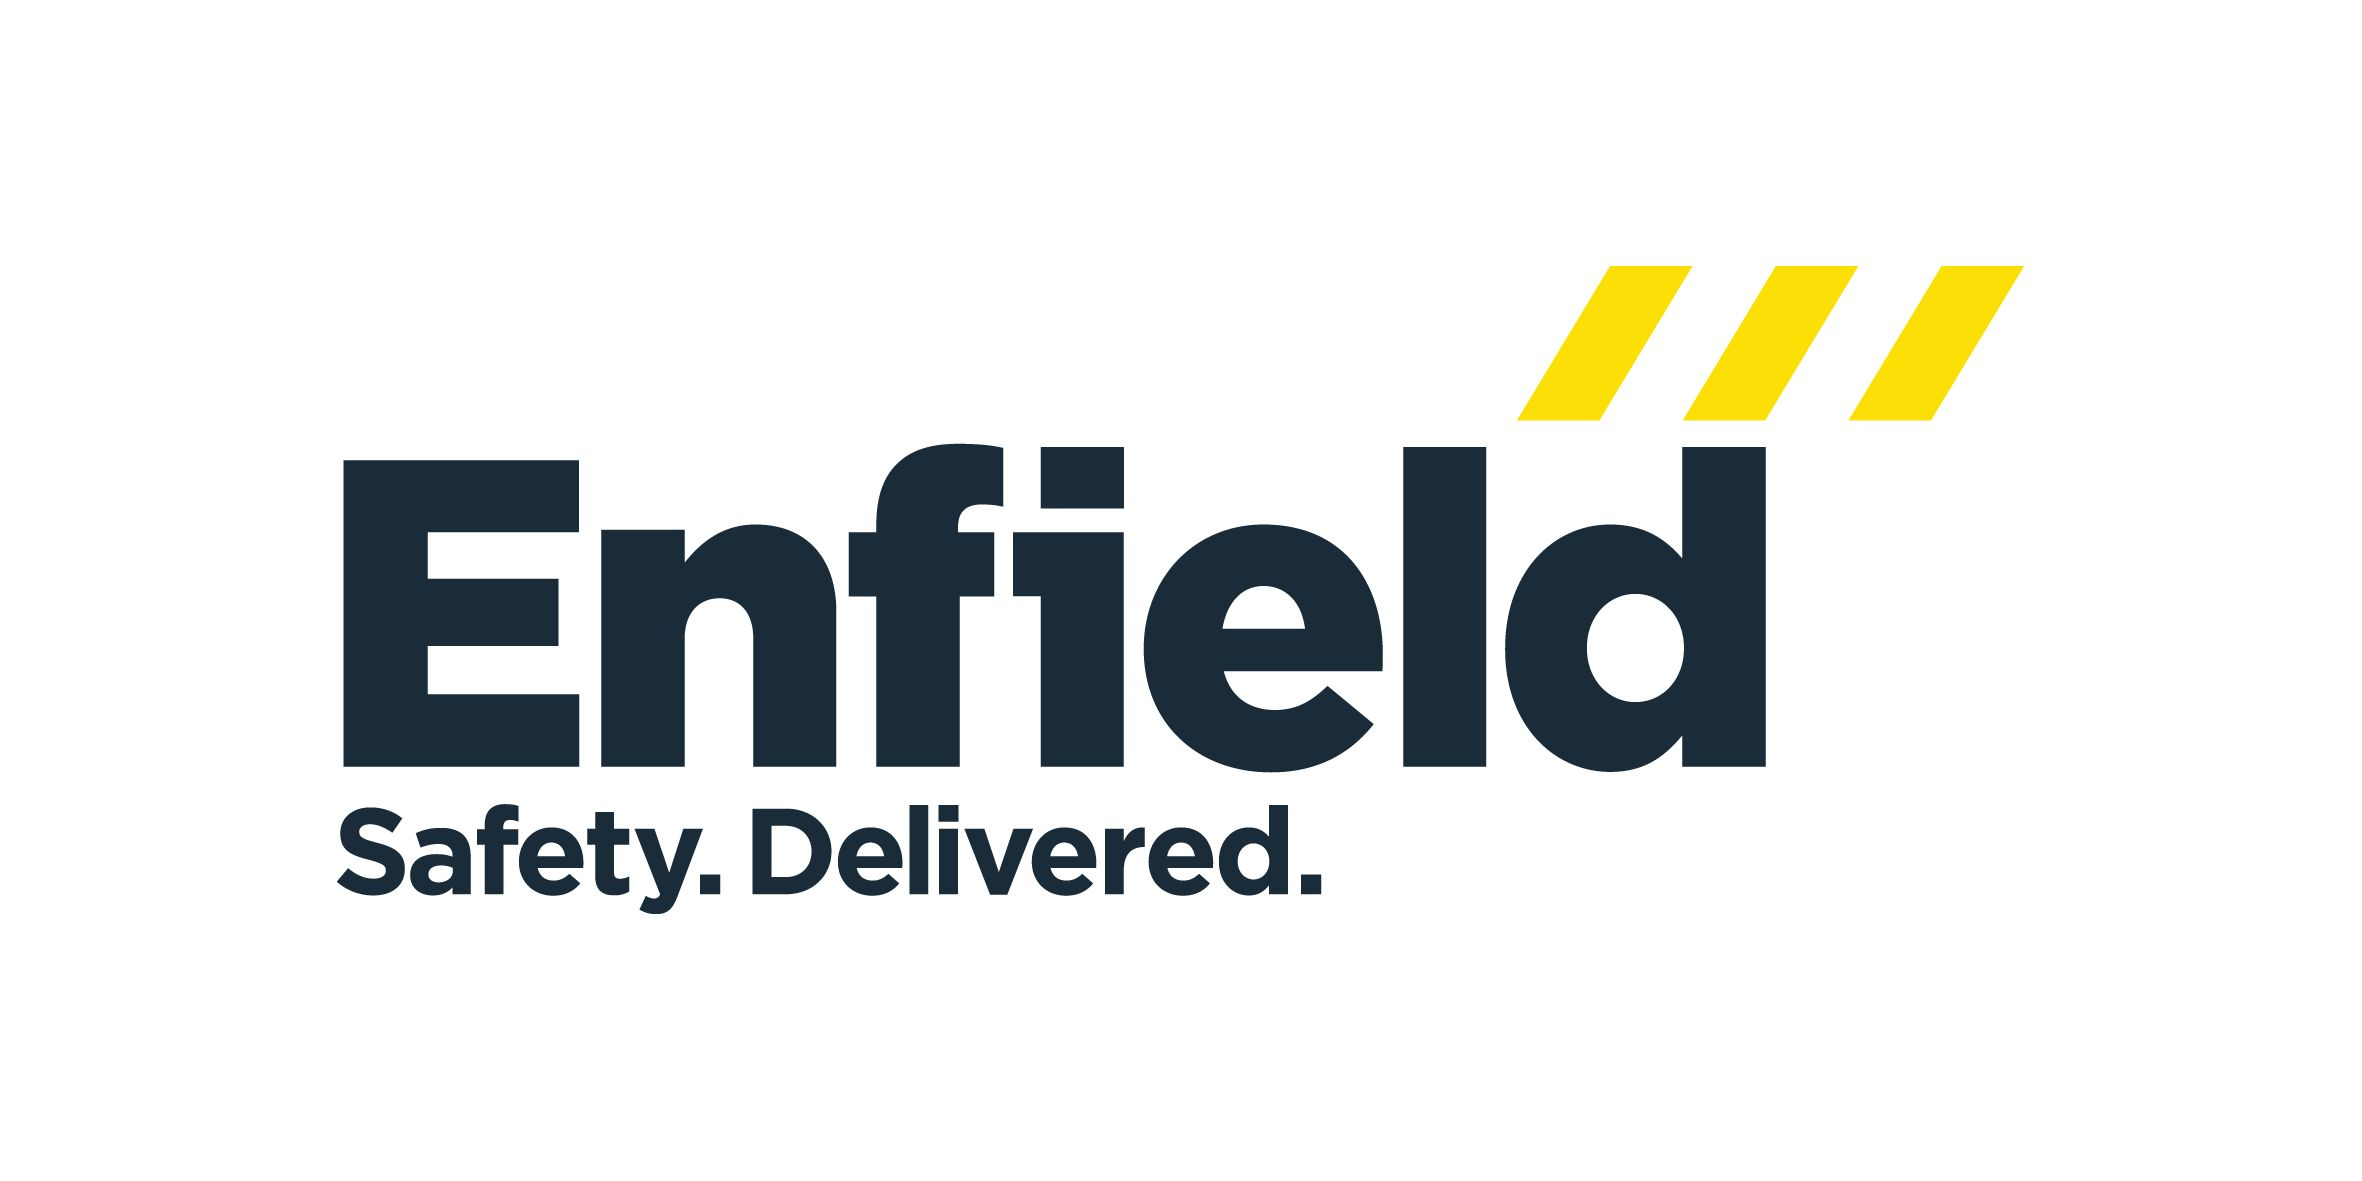 enfield_pantone_grey_yellow